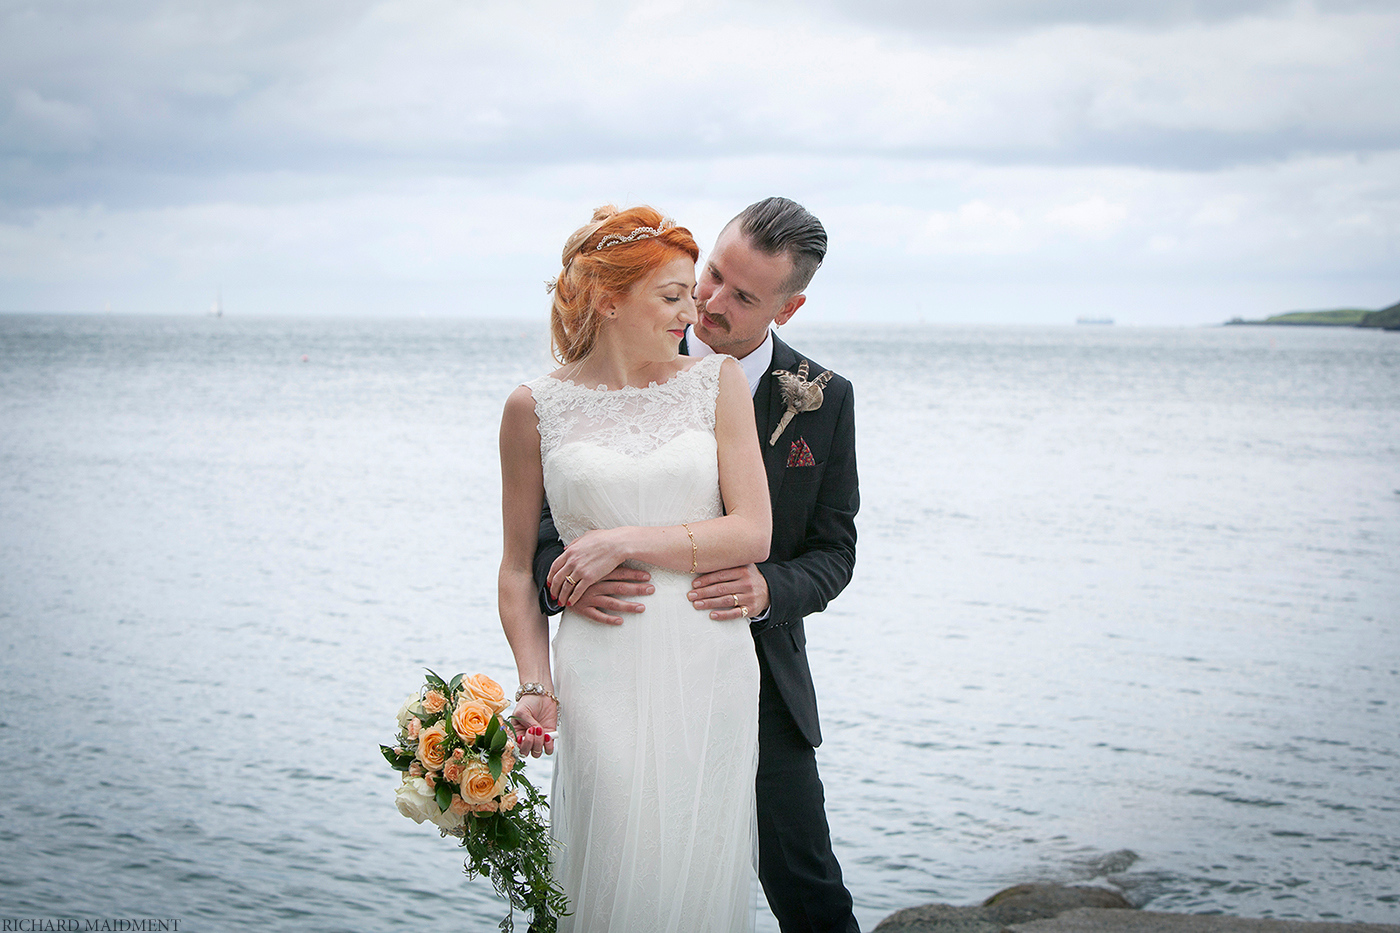 Richard Maidment - Wedding Photography (108).jpg